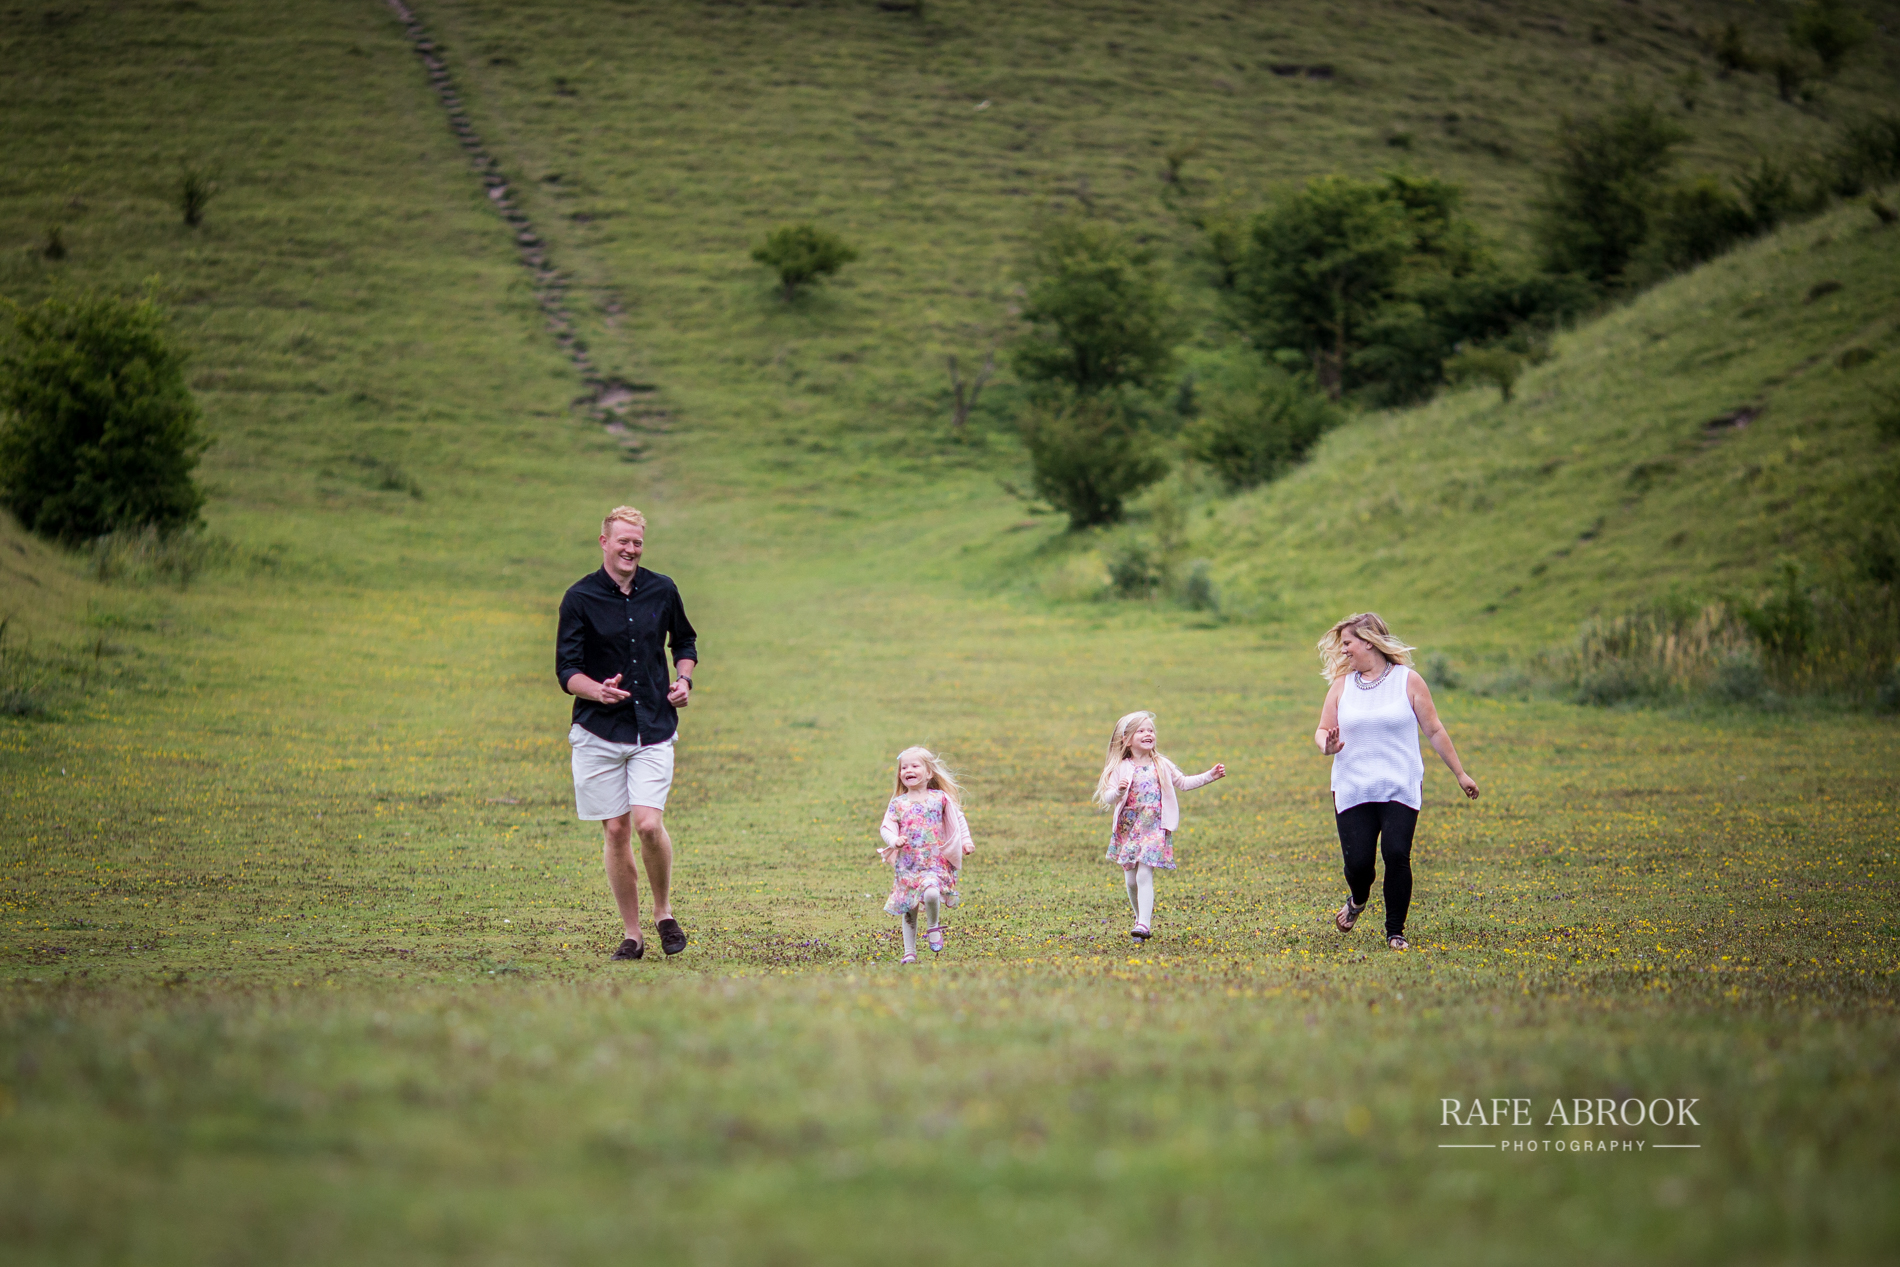 lisa & danny engagement shoot barton hills barton-le-clay bedfordshire-1013.jpg